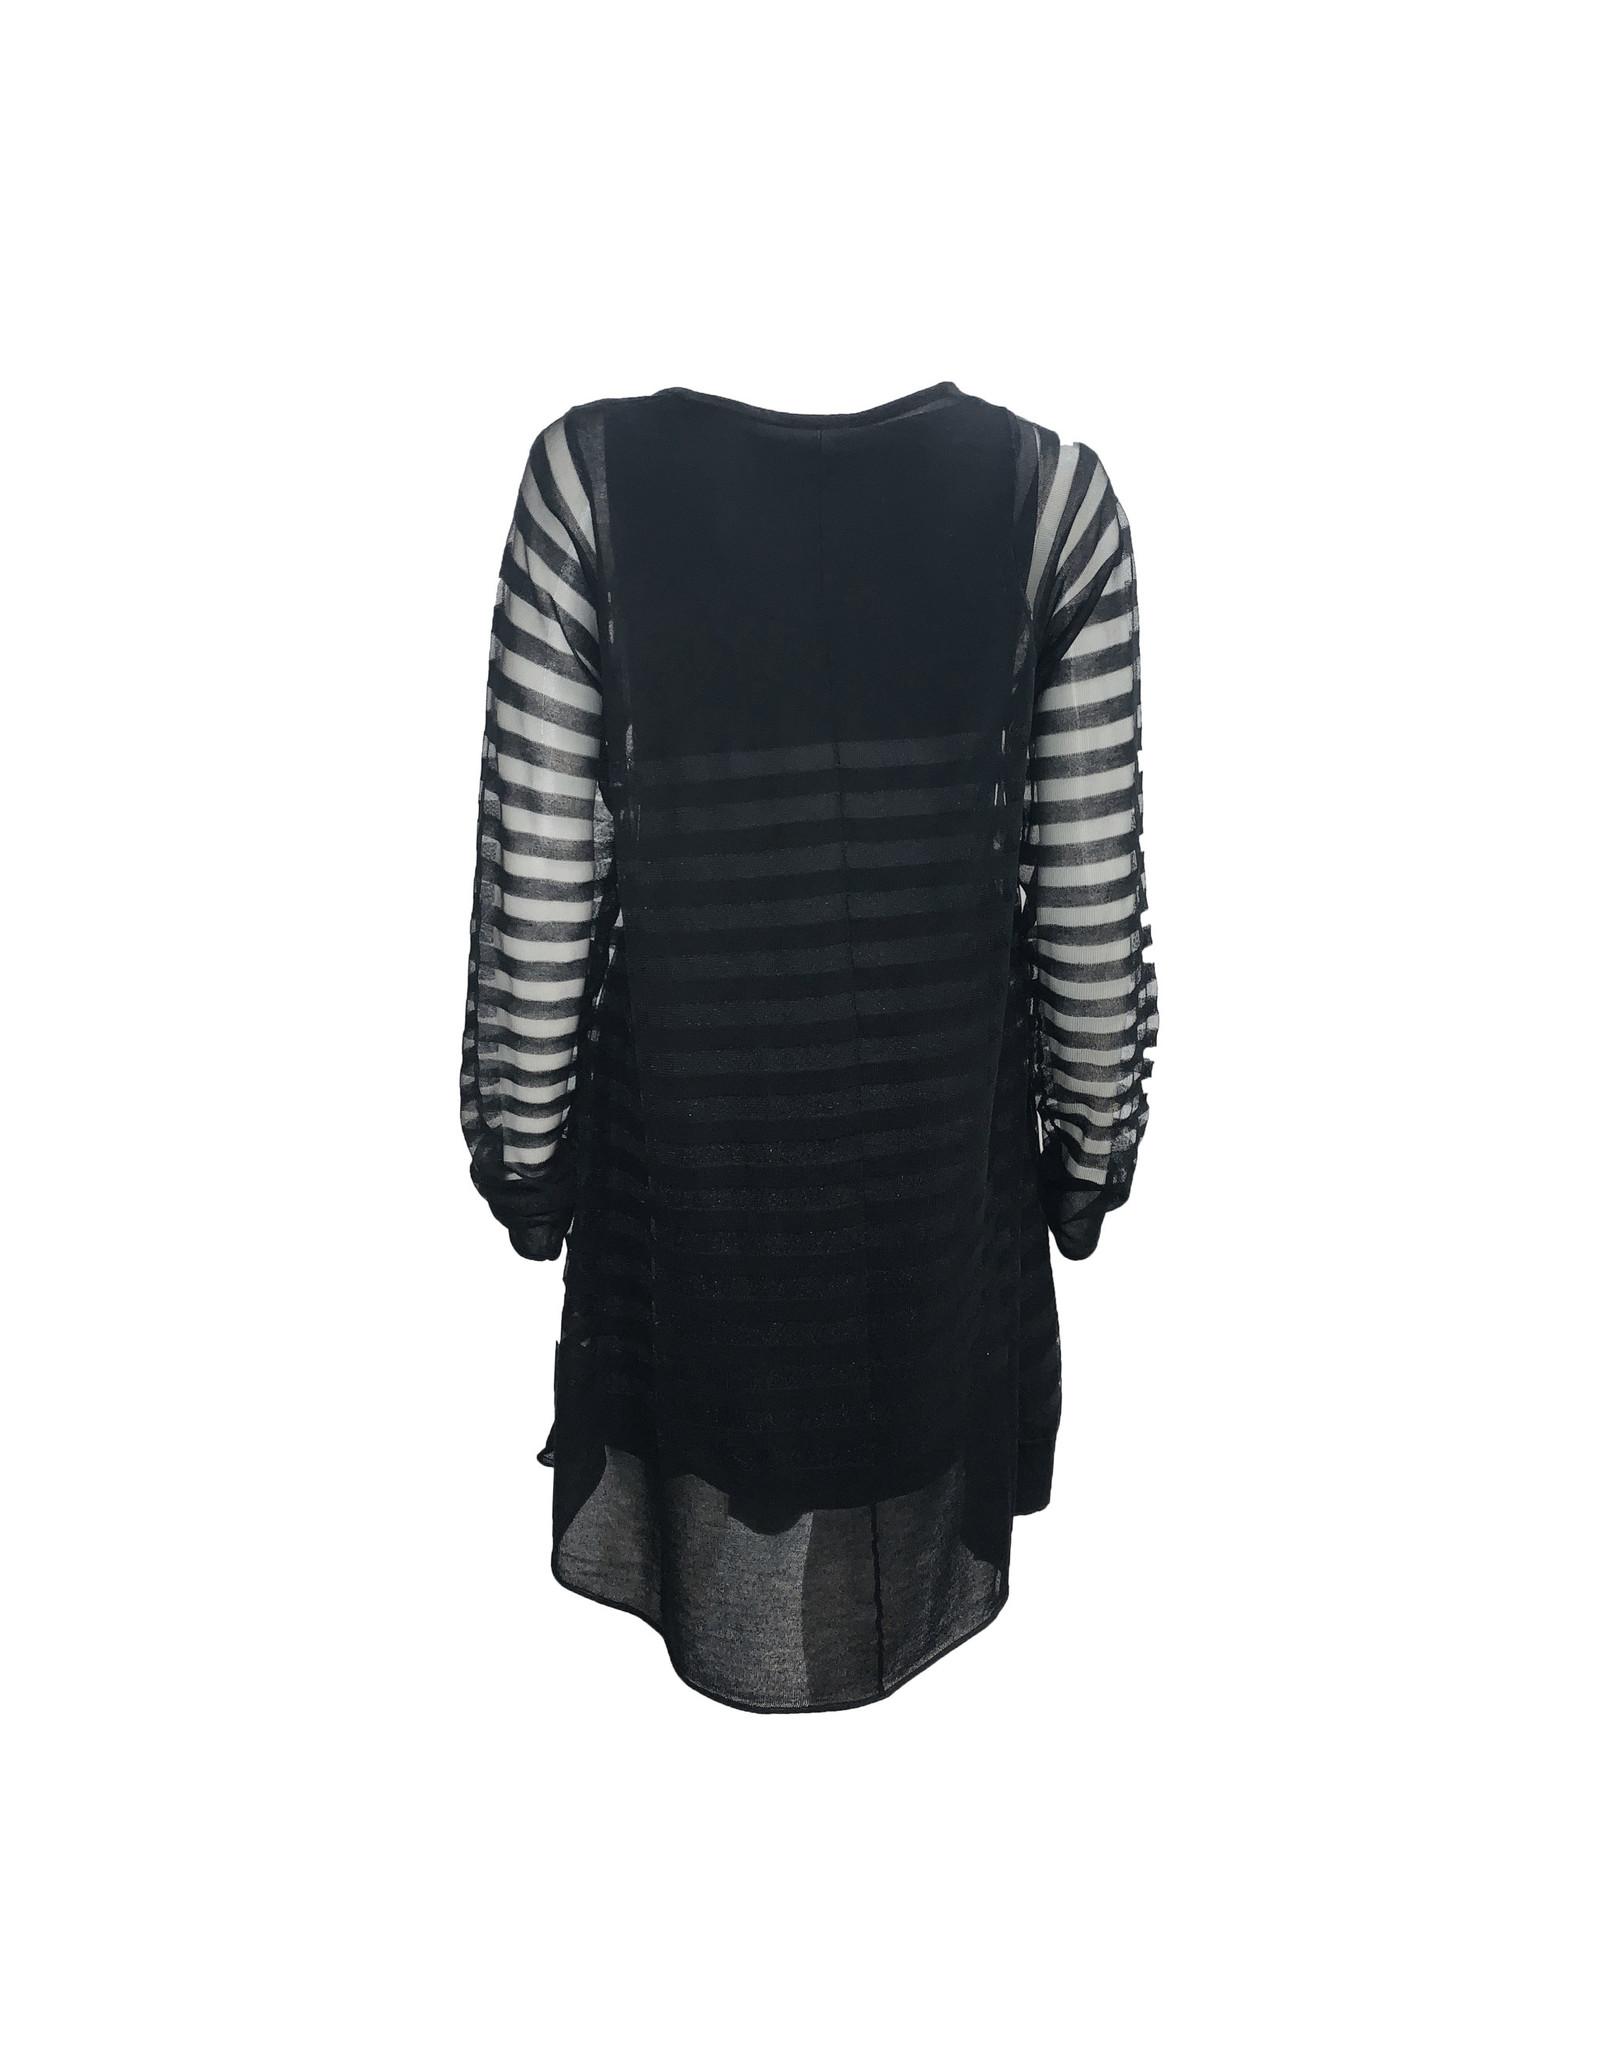 Studio Rundholz Studio Rundholz Knitted Tunic - Black